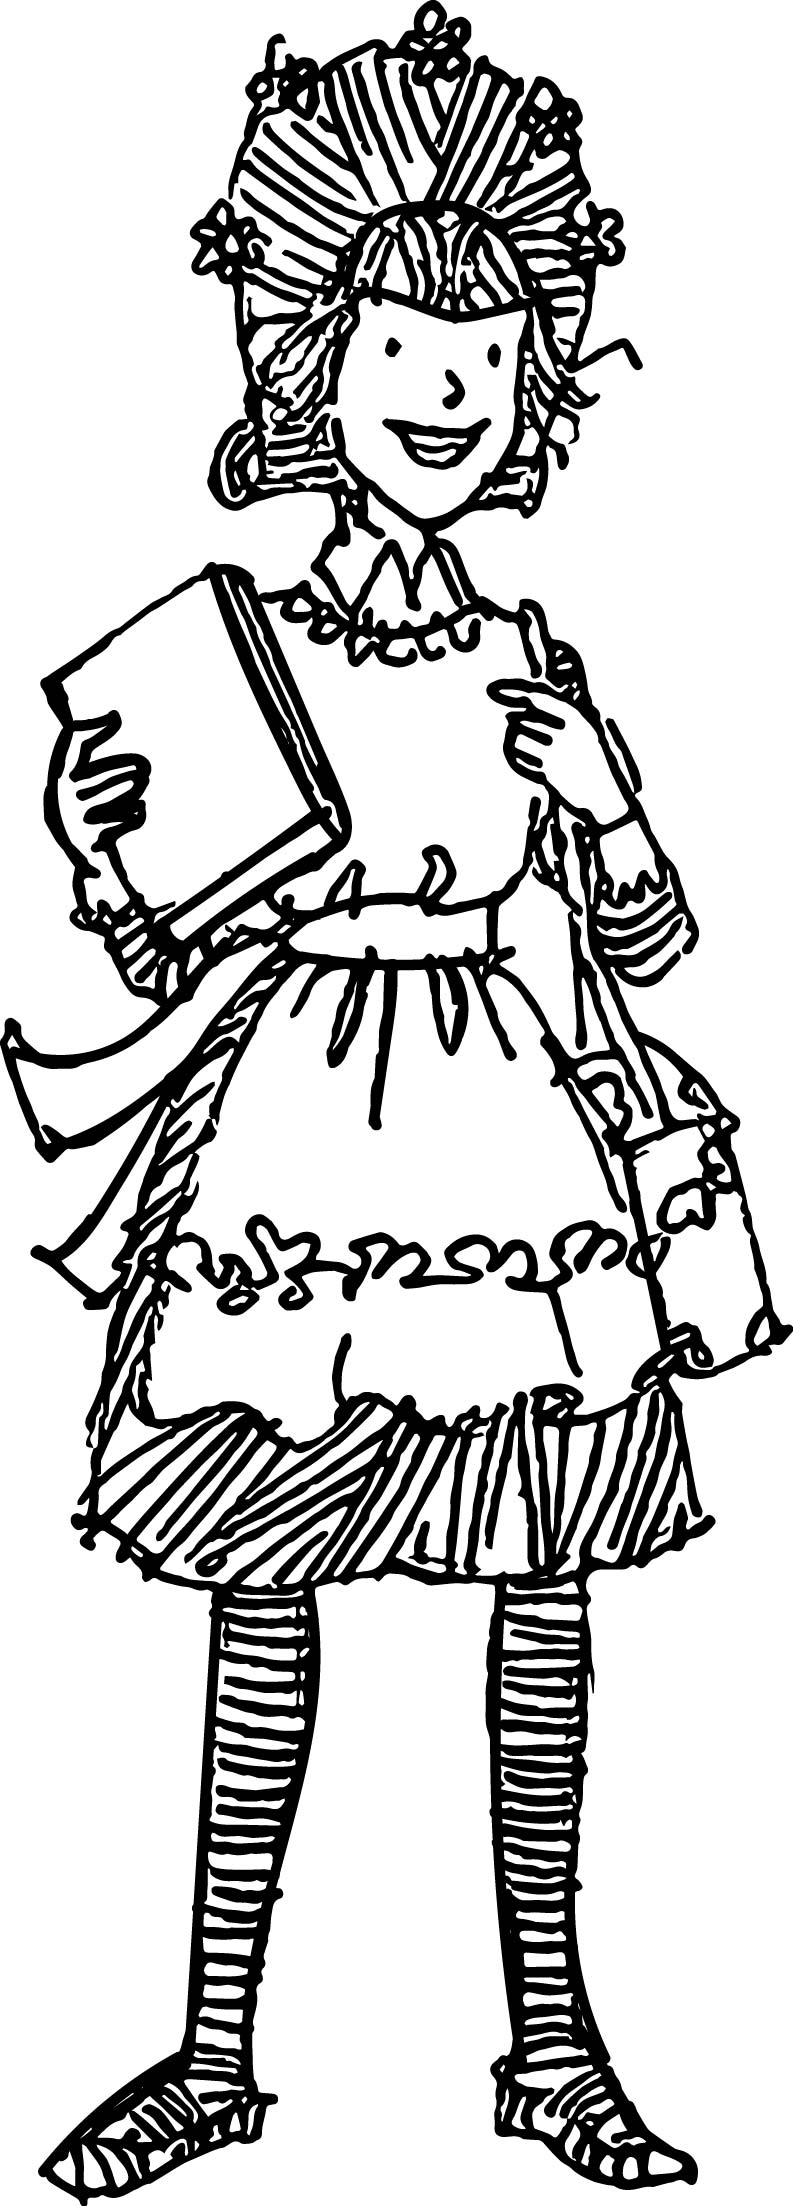 Amelia Bedelia Student Coloring Page